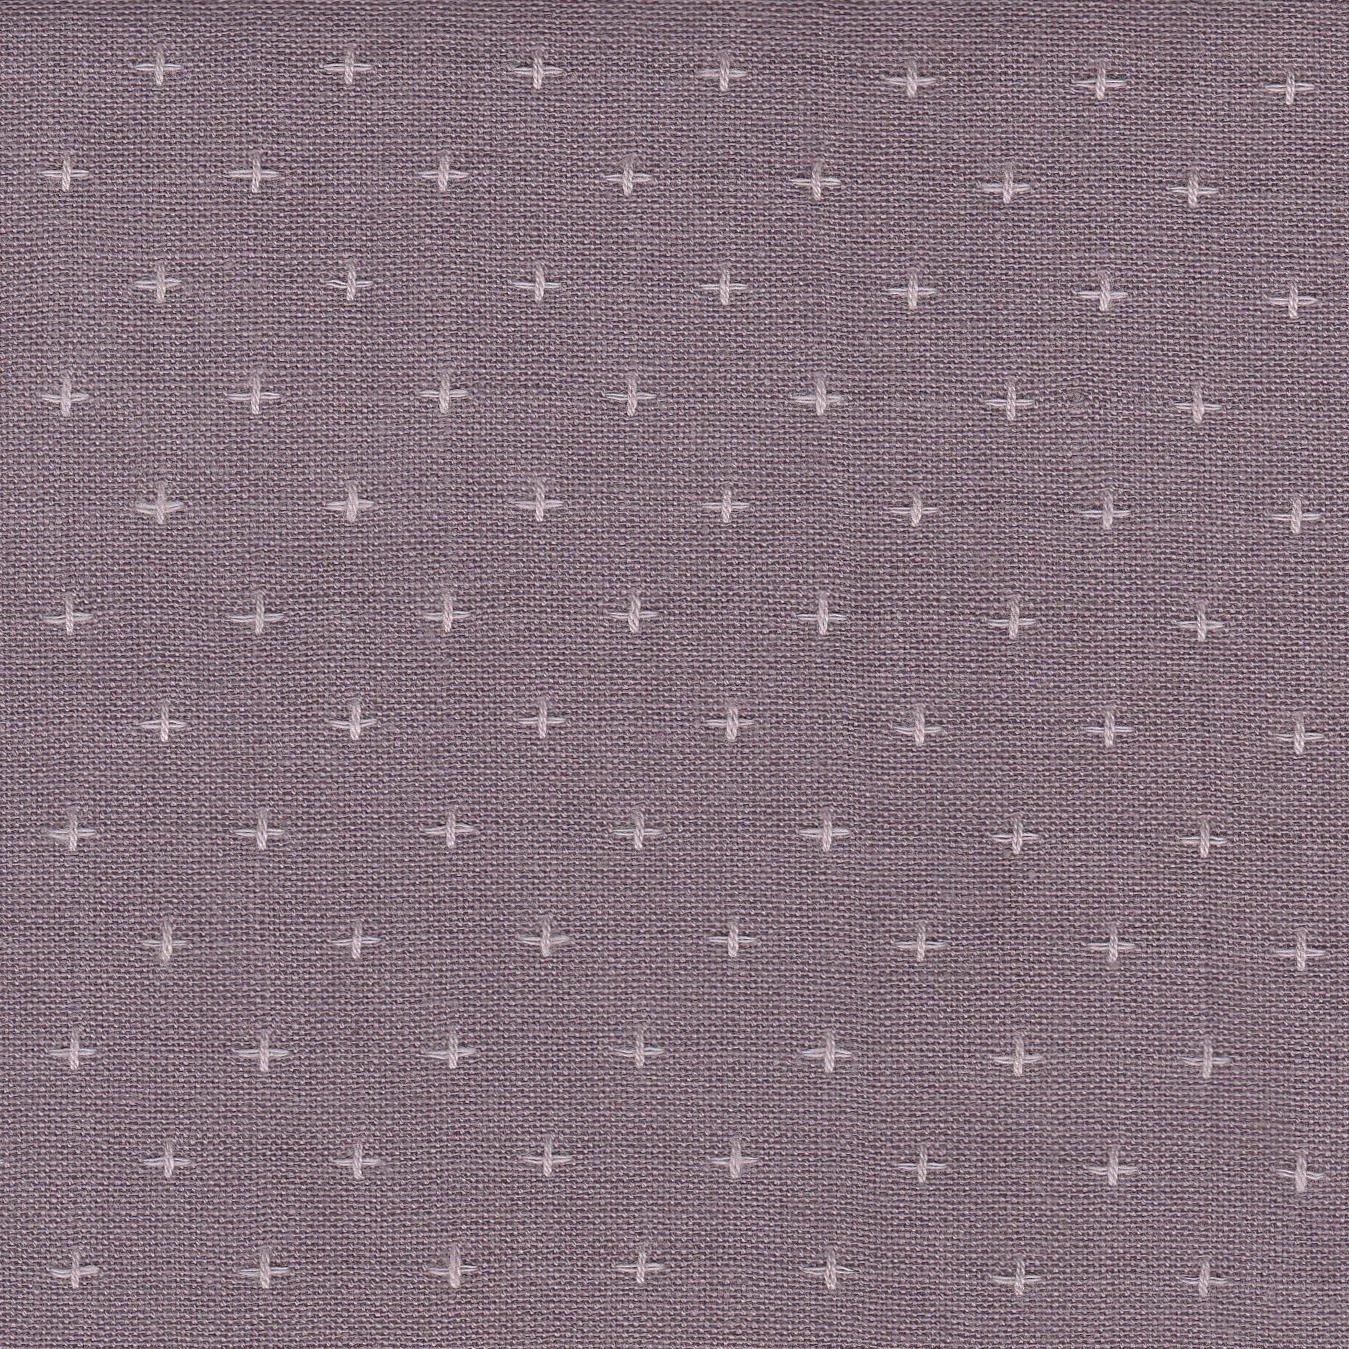 Diamond Textiles Manchester - Pluses and Crosses (Lavender)